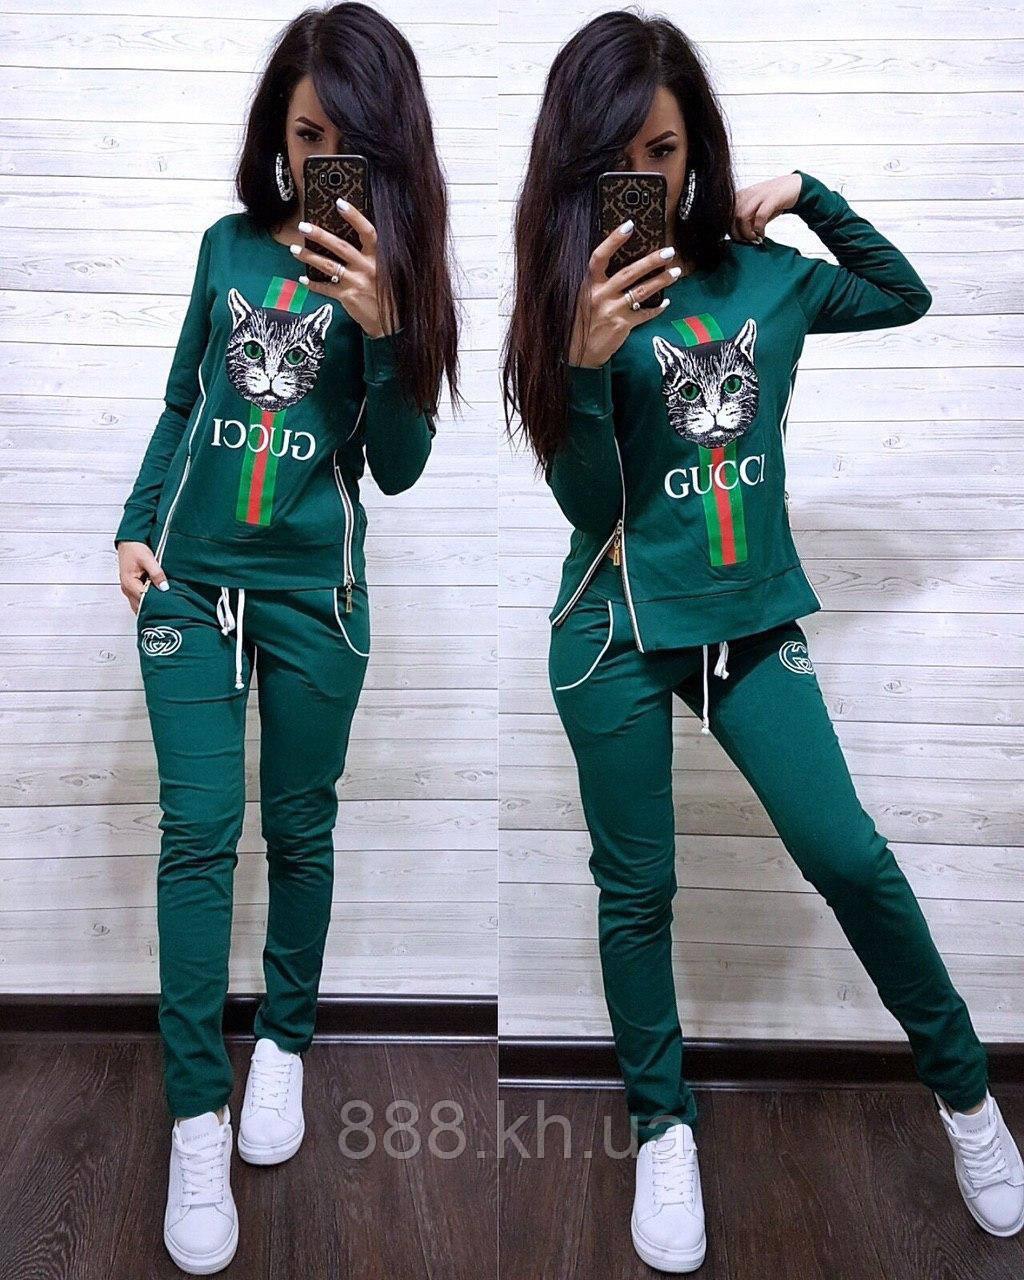 Женский спортивный костюм, костюм для прогулок S/M/L/XL/2XL (зеленый)